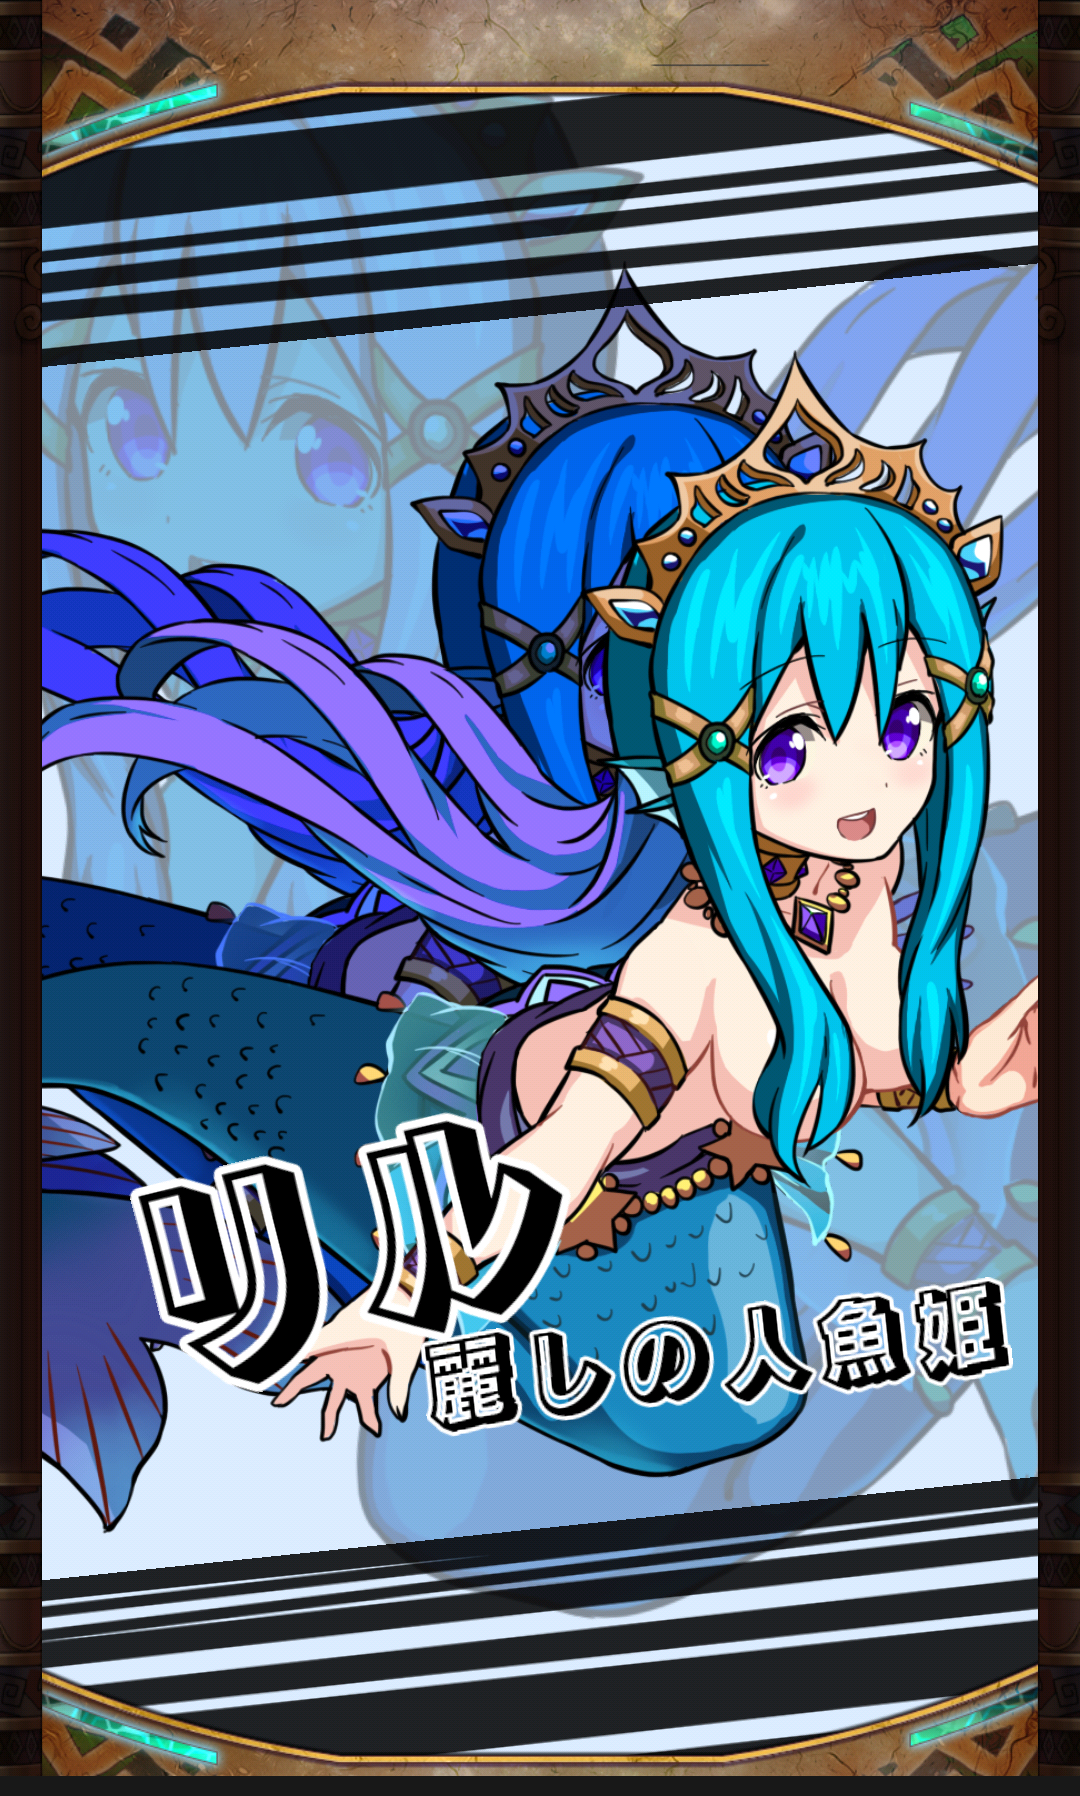 androidアプリ アニモン 人魚姫マーメの冒険攻略スクリーンショット1